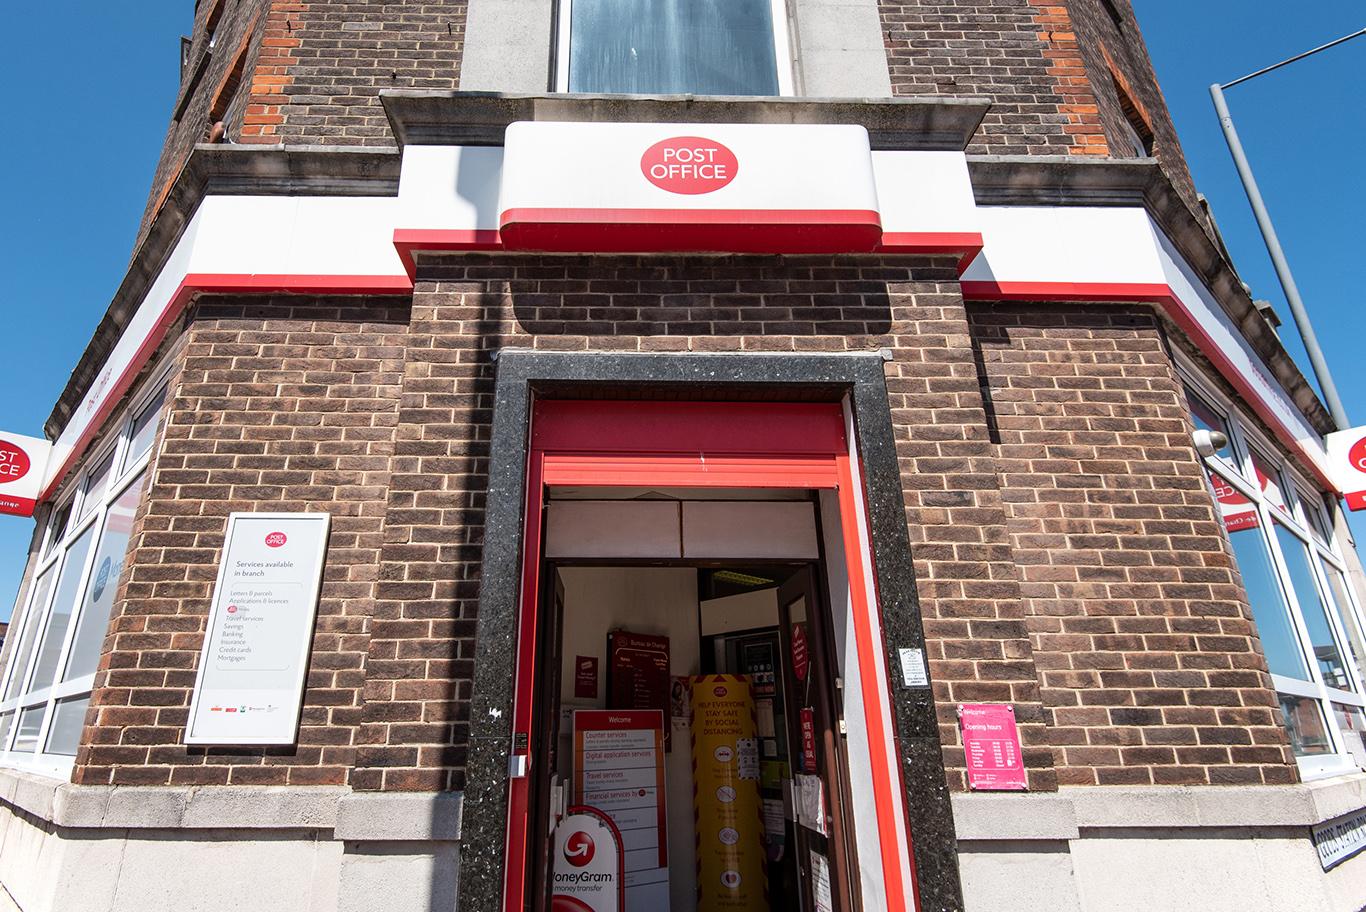 Royal Tunbridge Wells Main Post Office